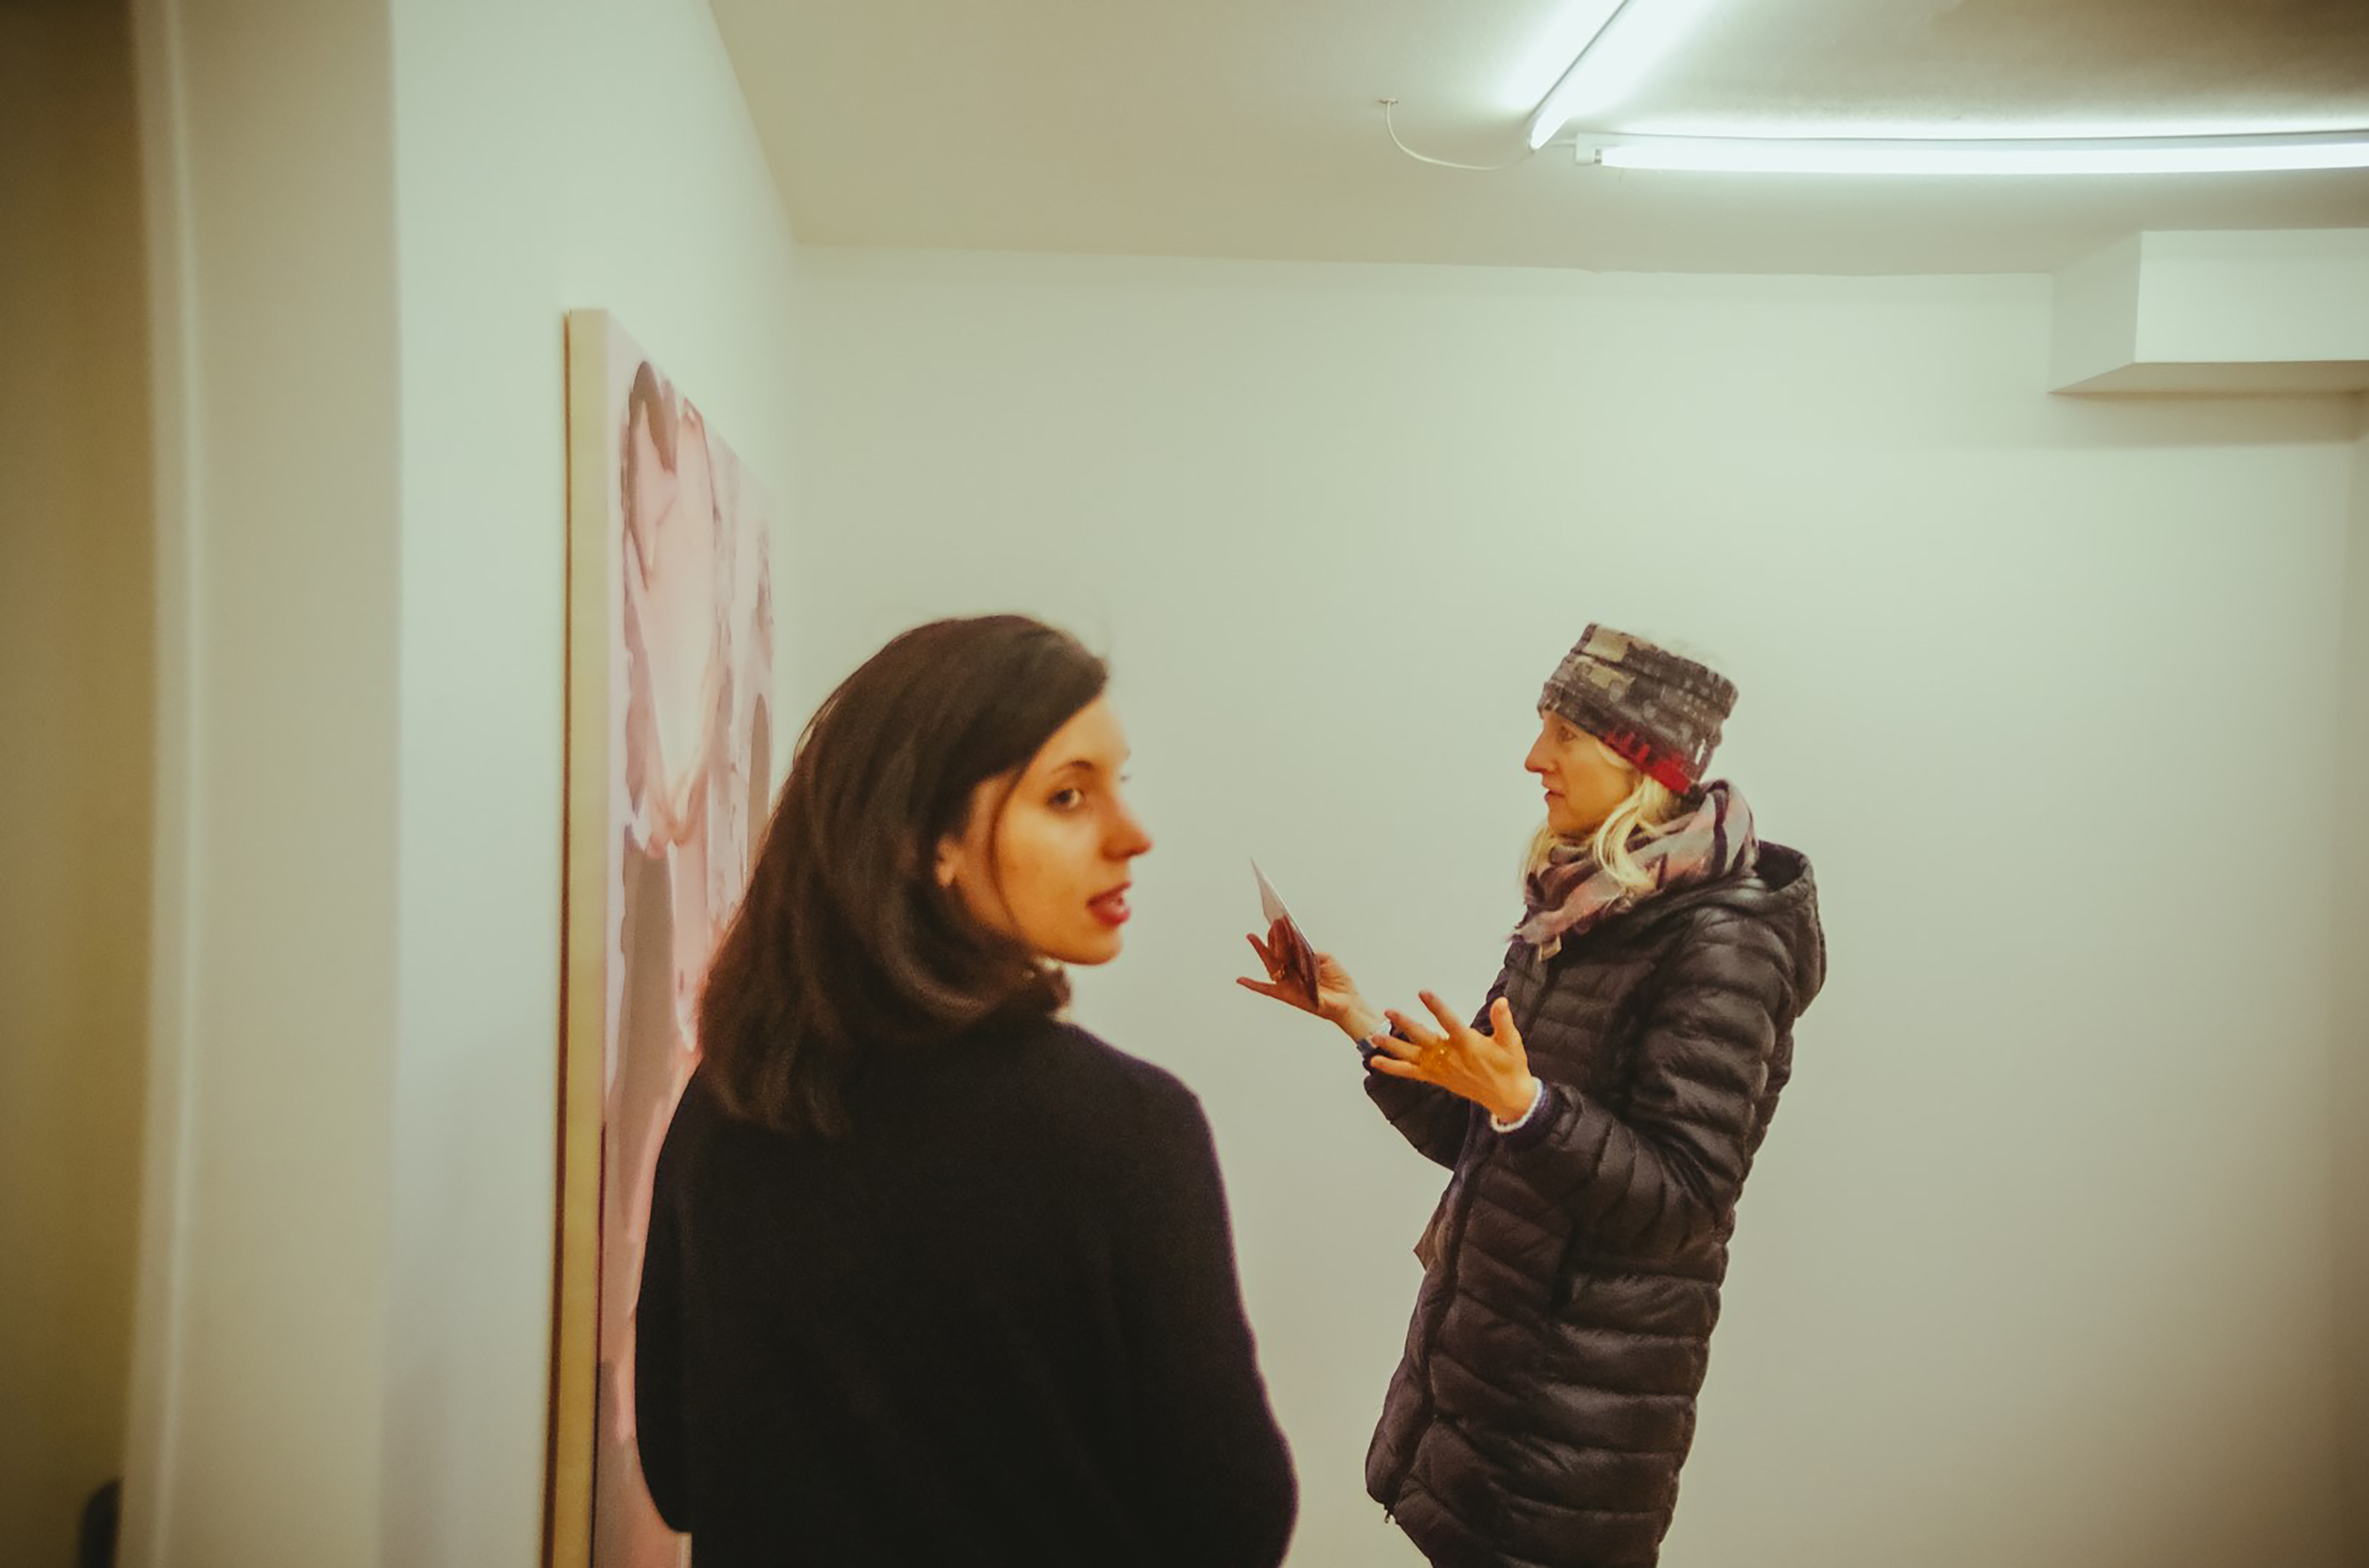 Visiteuse galerie Fatiha Selam ©Rubens Ben (6).jpg